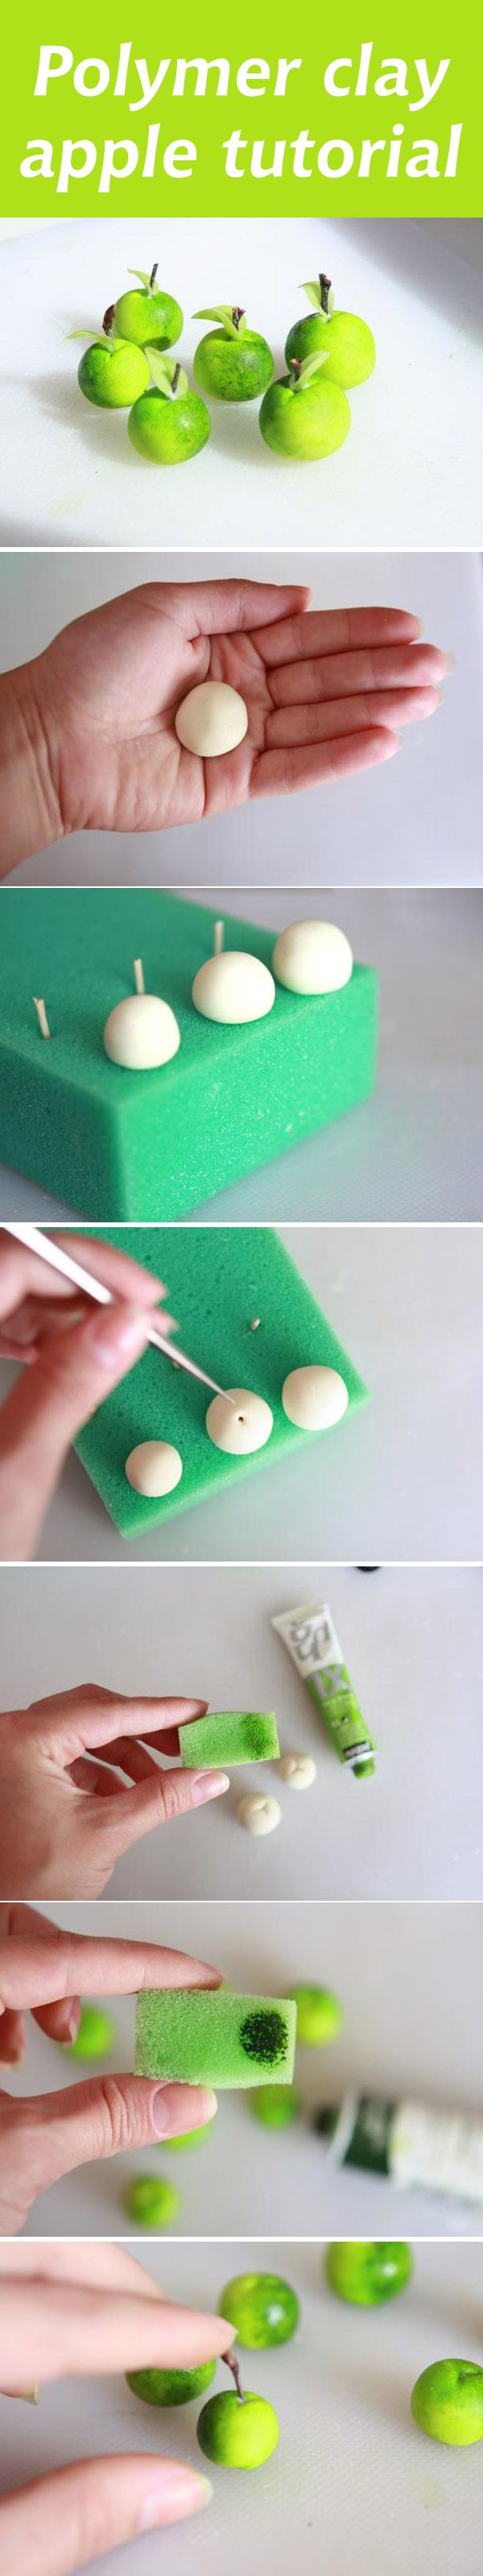 Polymer clay apple tutorial